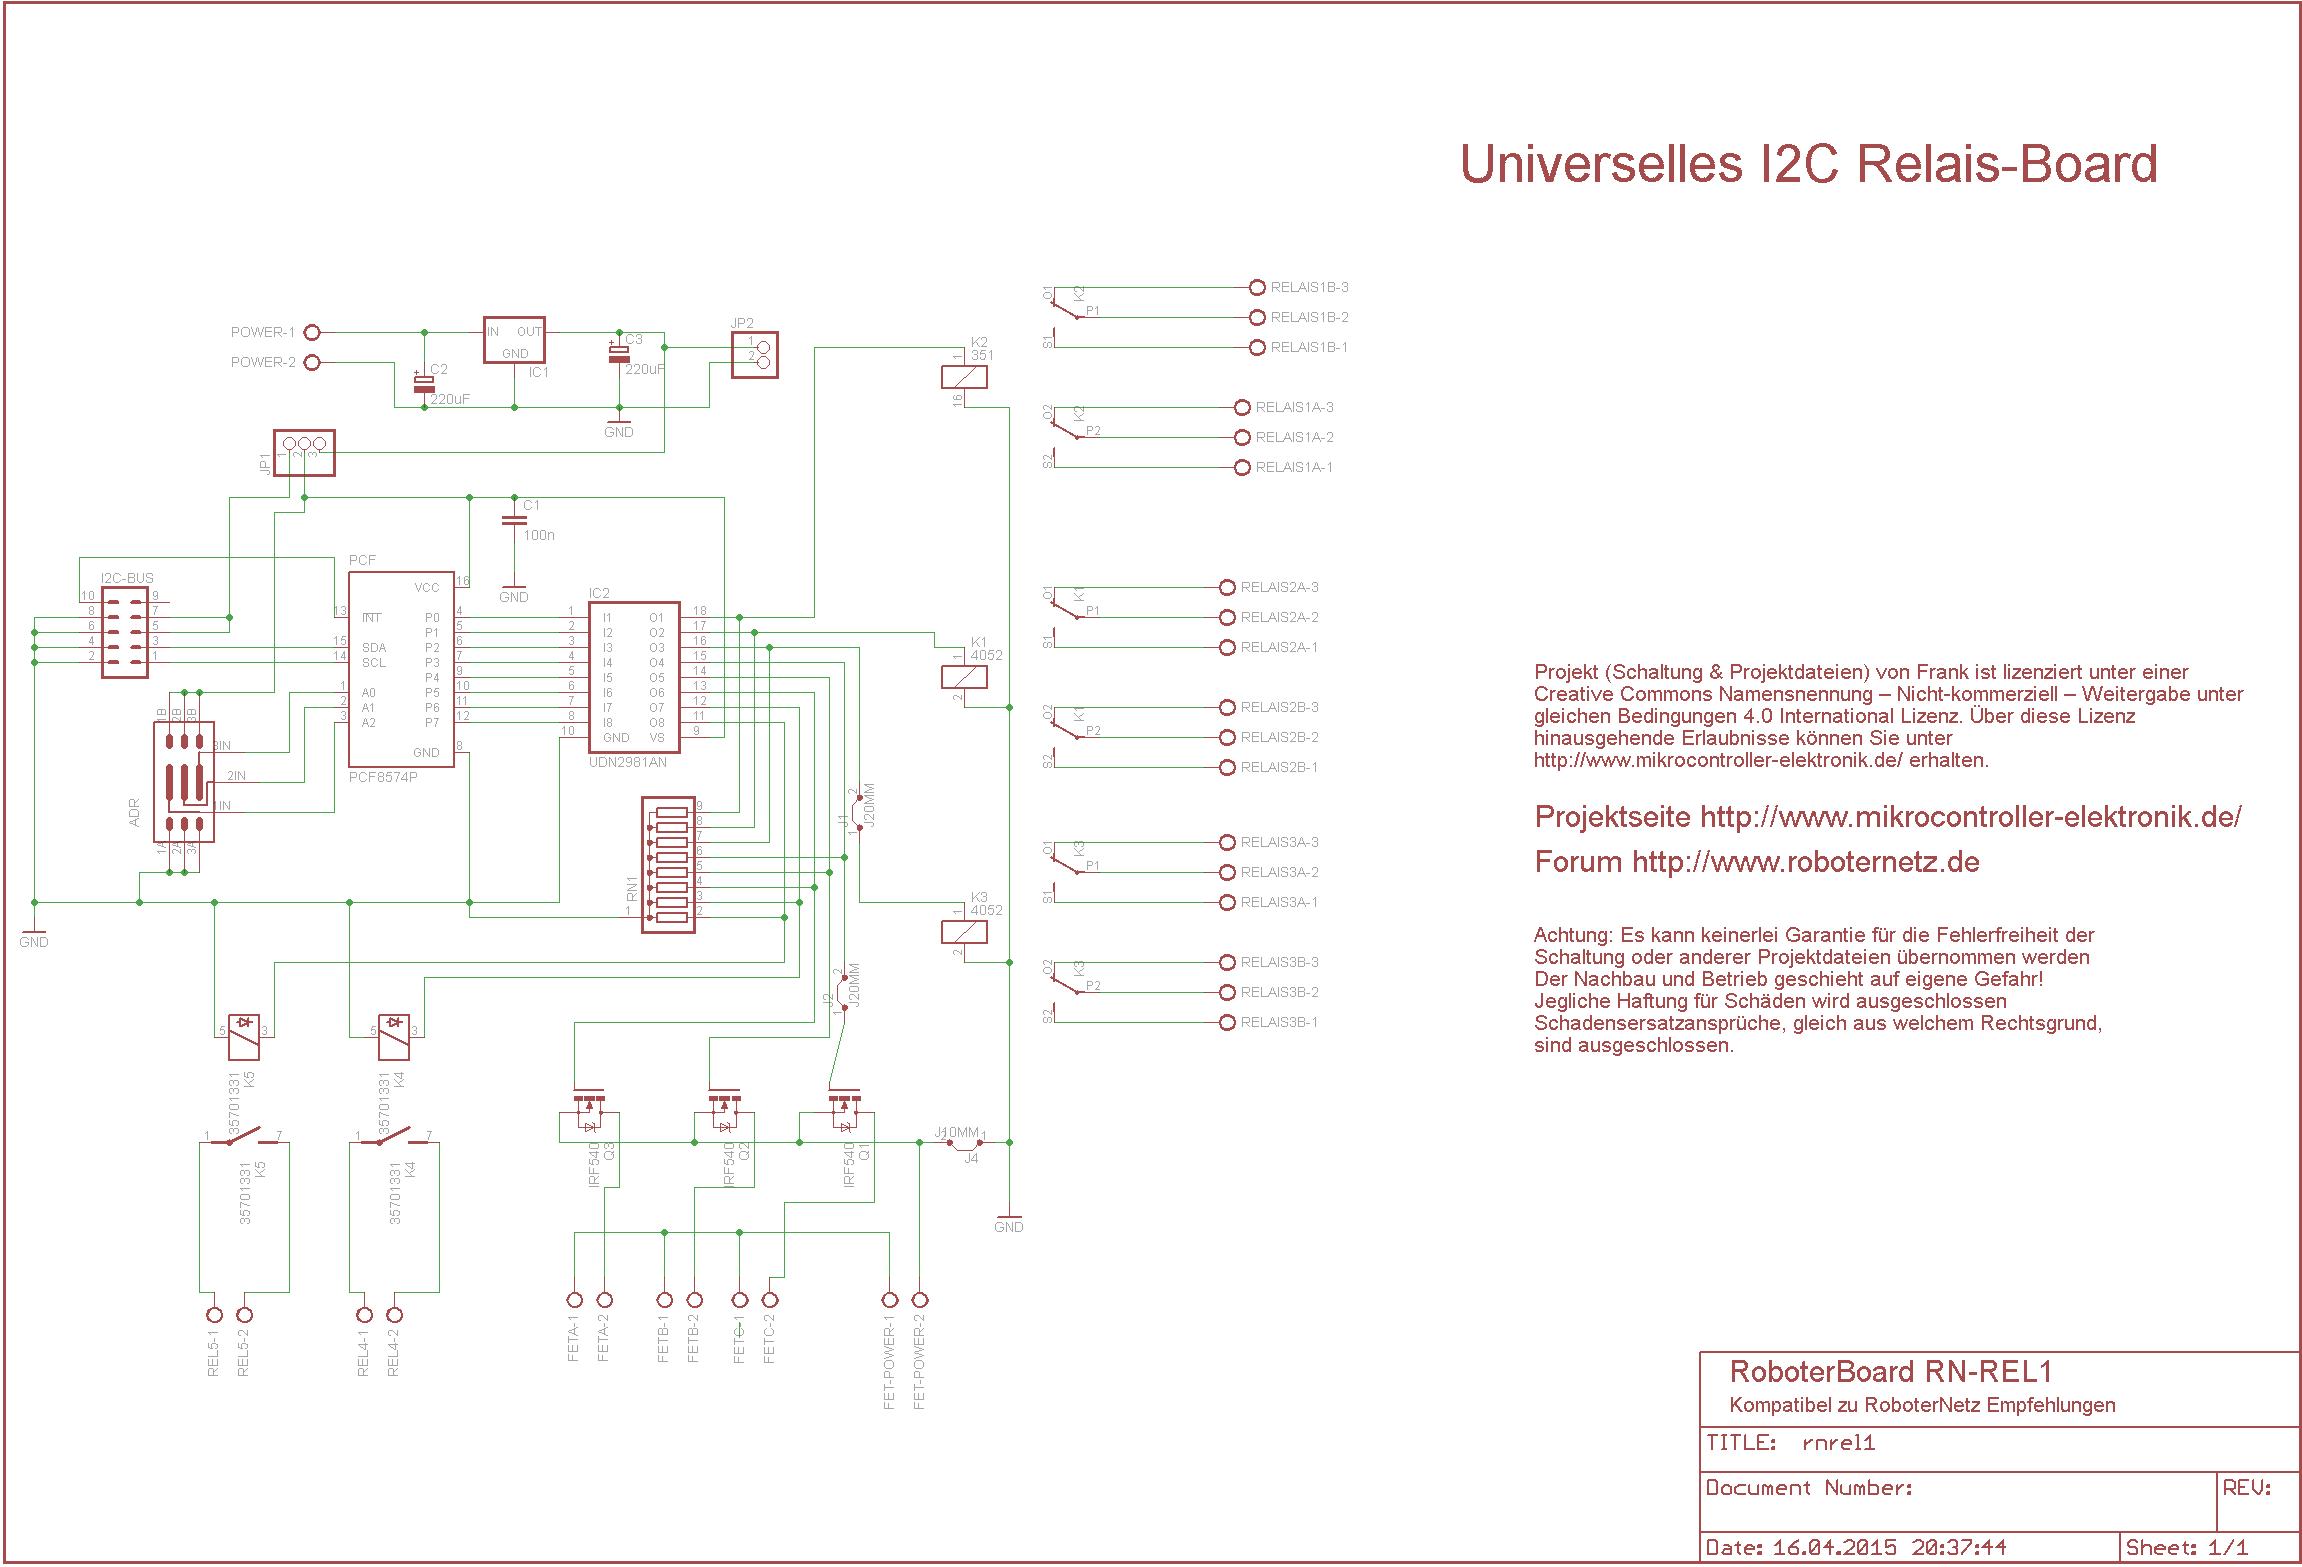 I2C - Relaiskarte - Mikrocontroller-Elektronik.deMikrocontroller ...